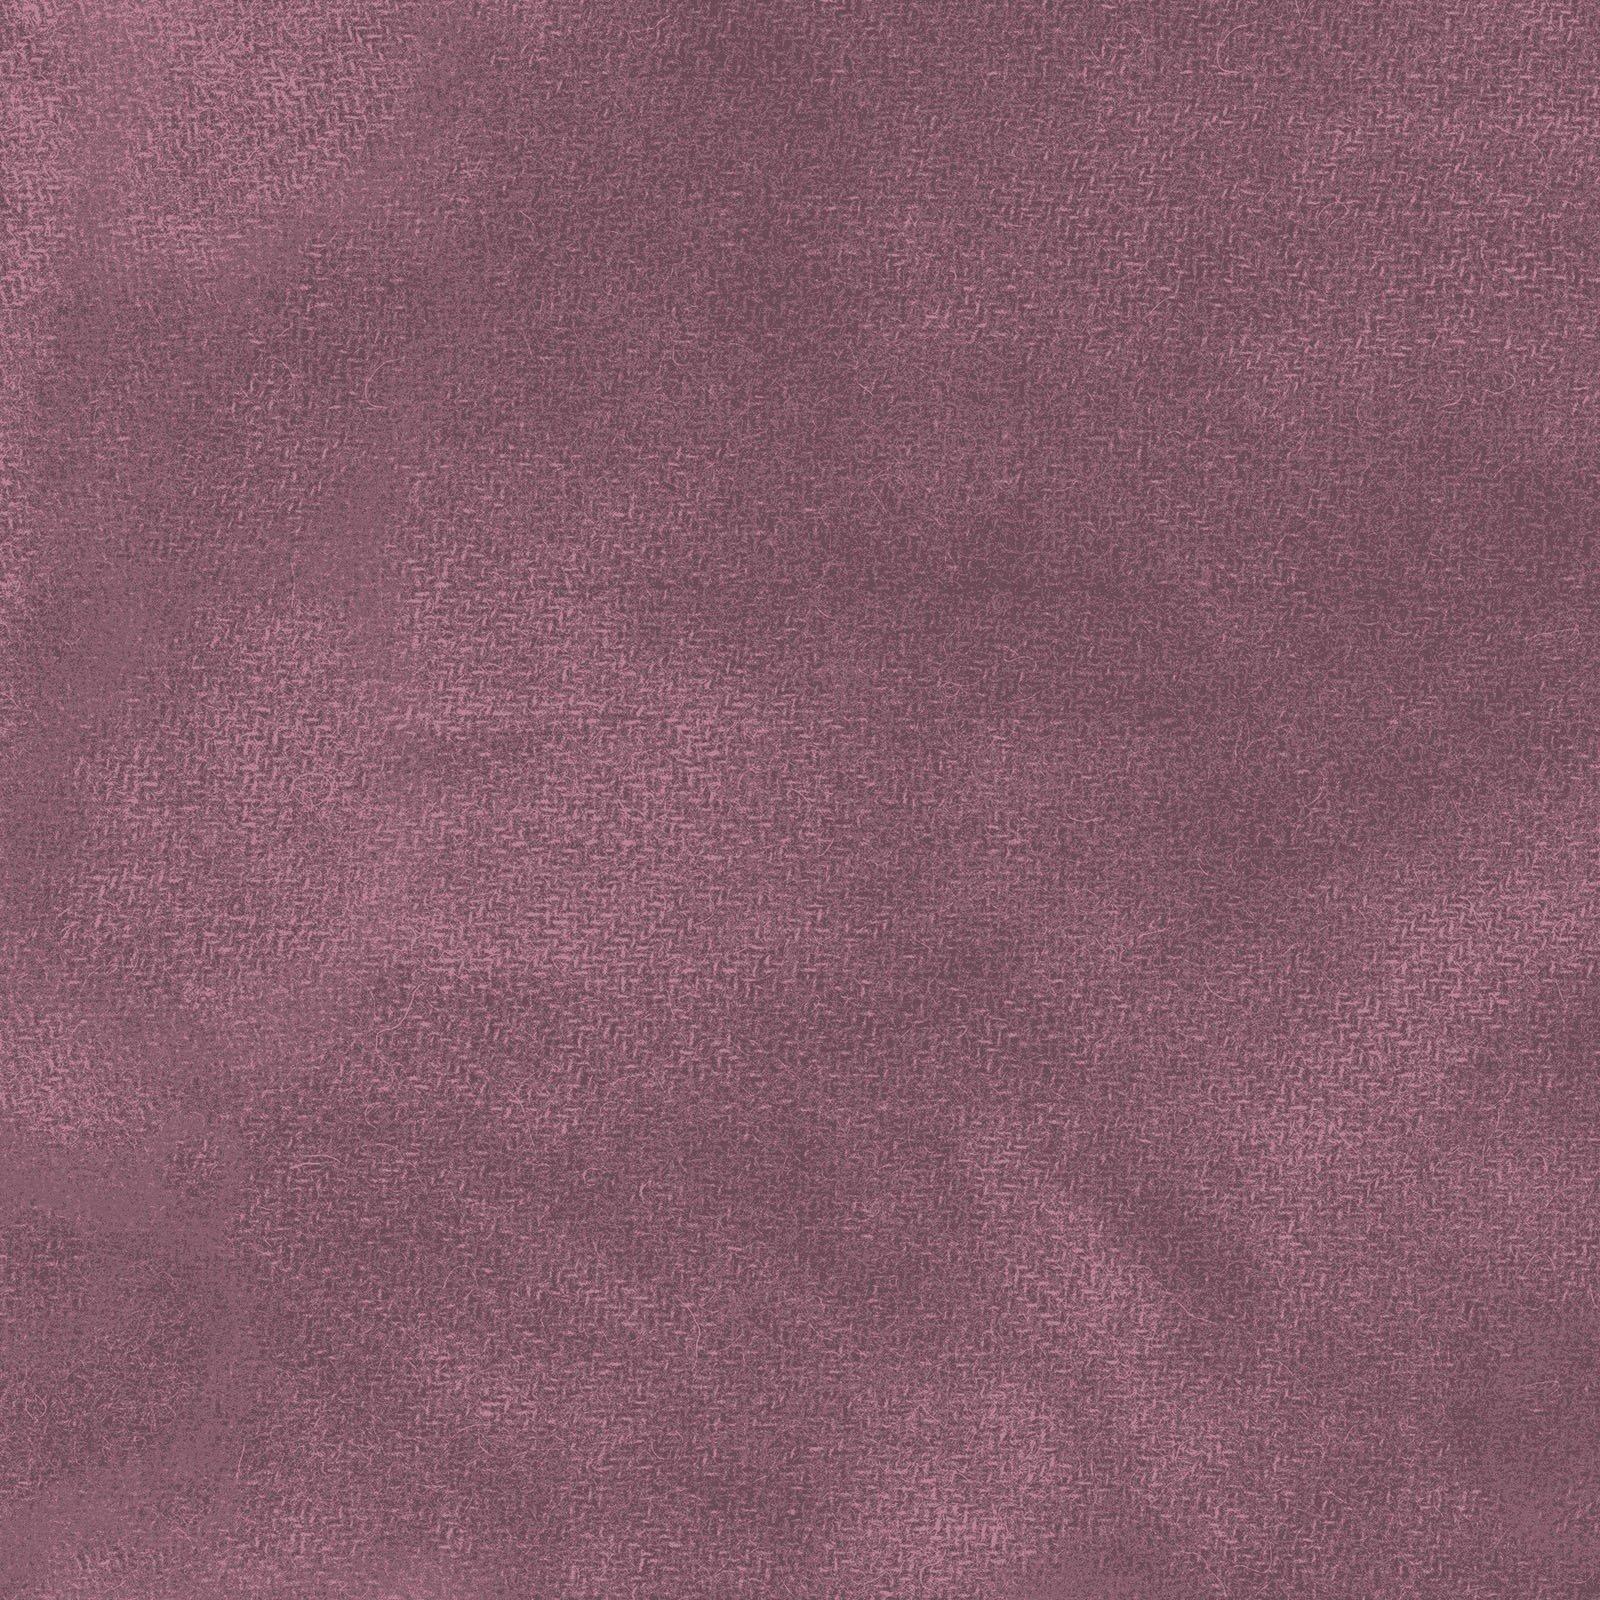 Color Wash Woolies Flannel - Violet Blush